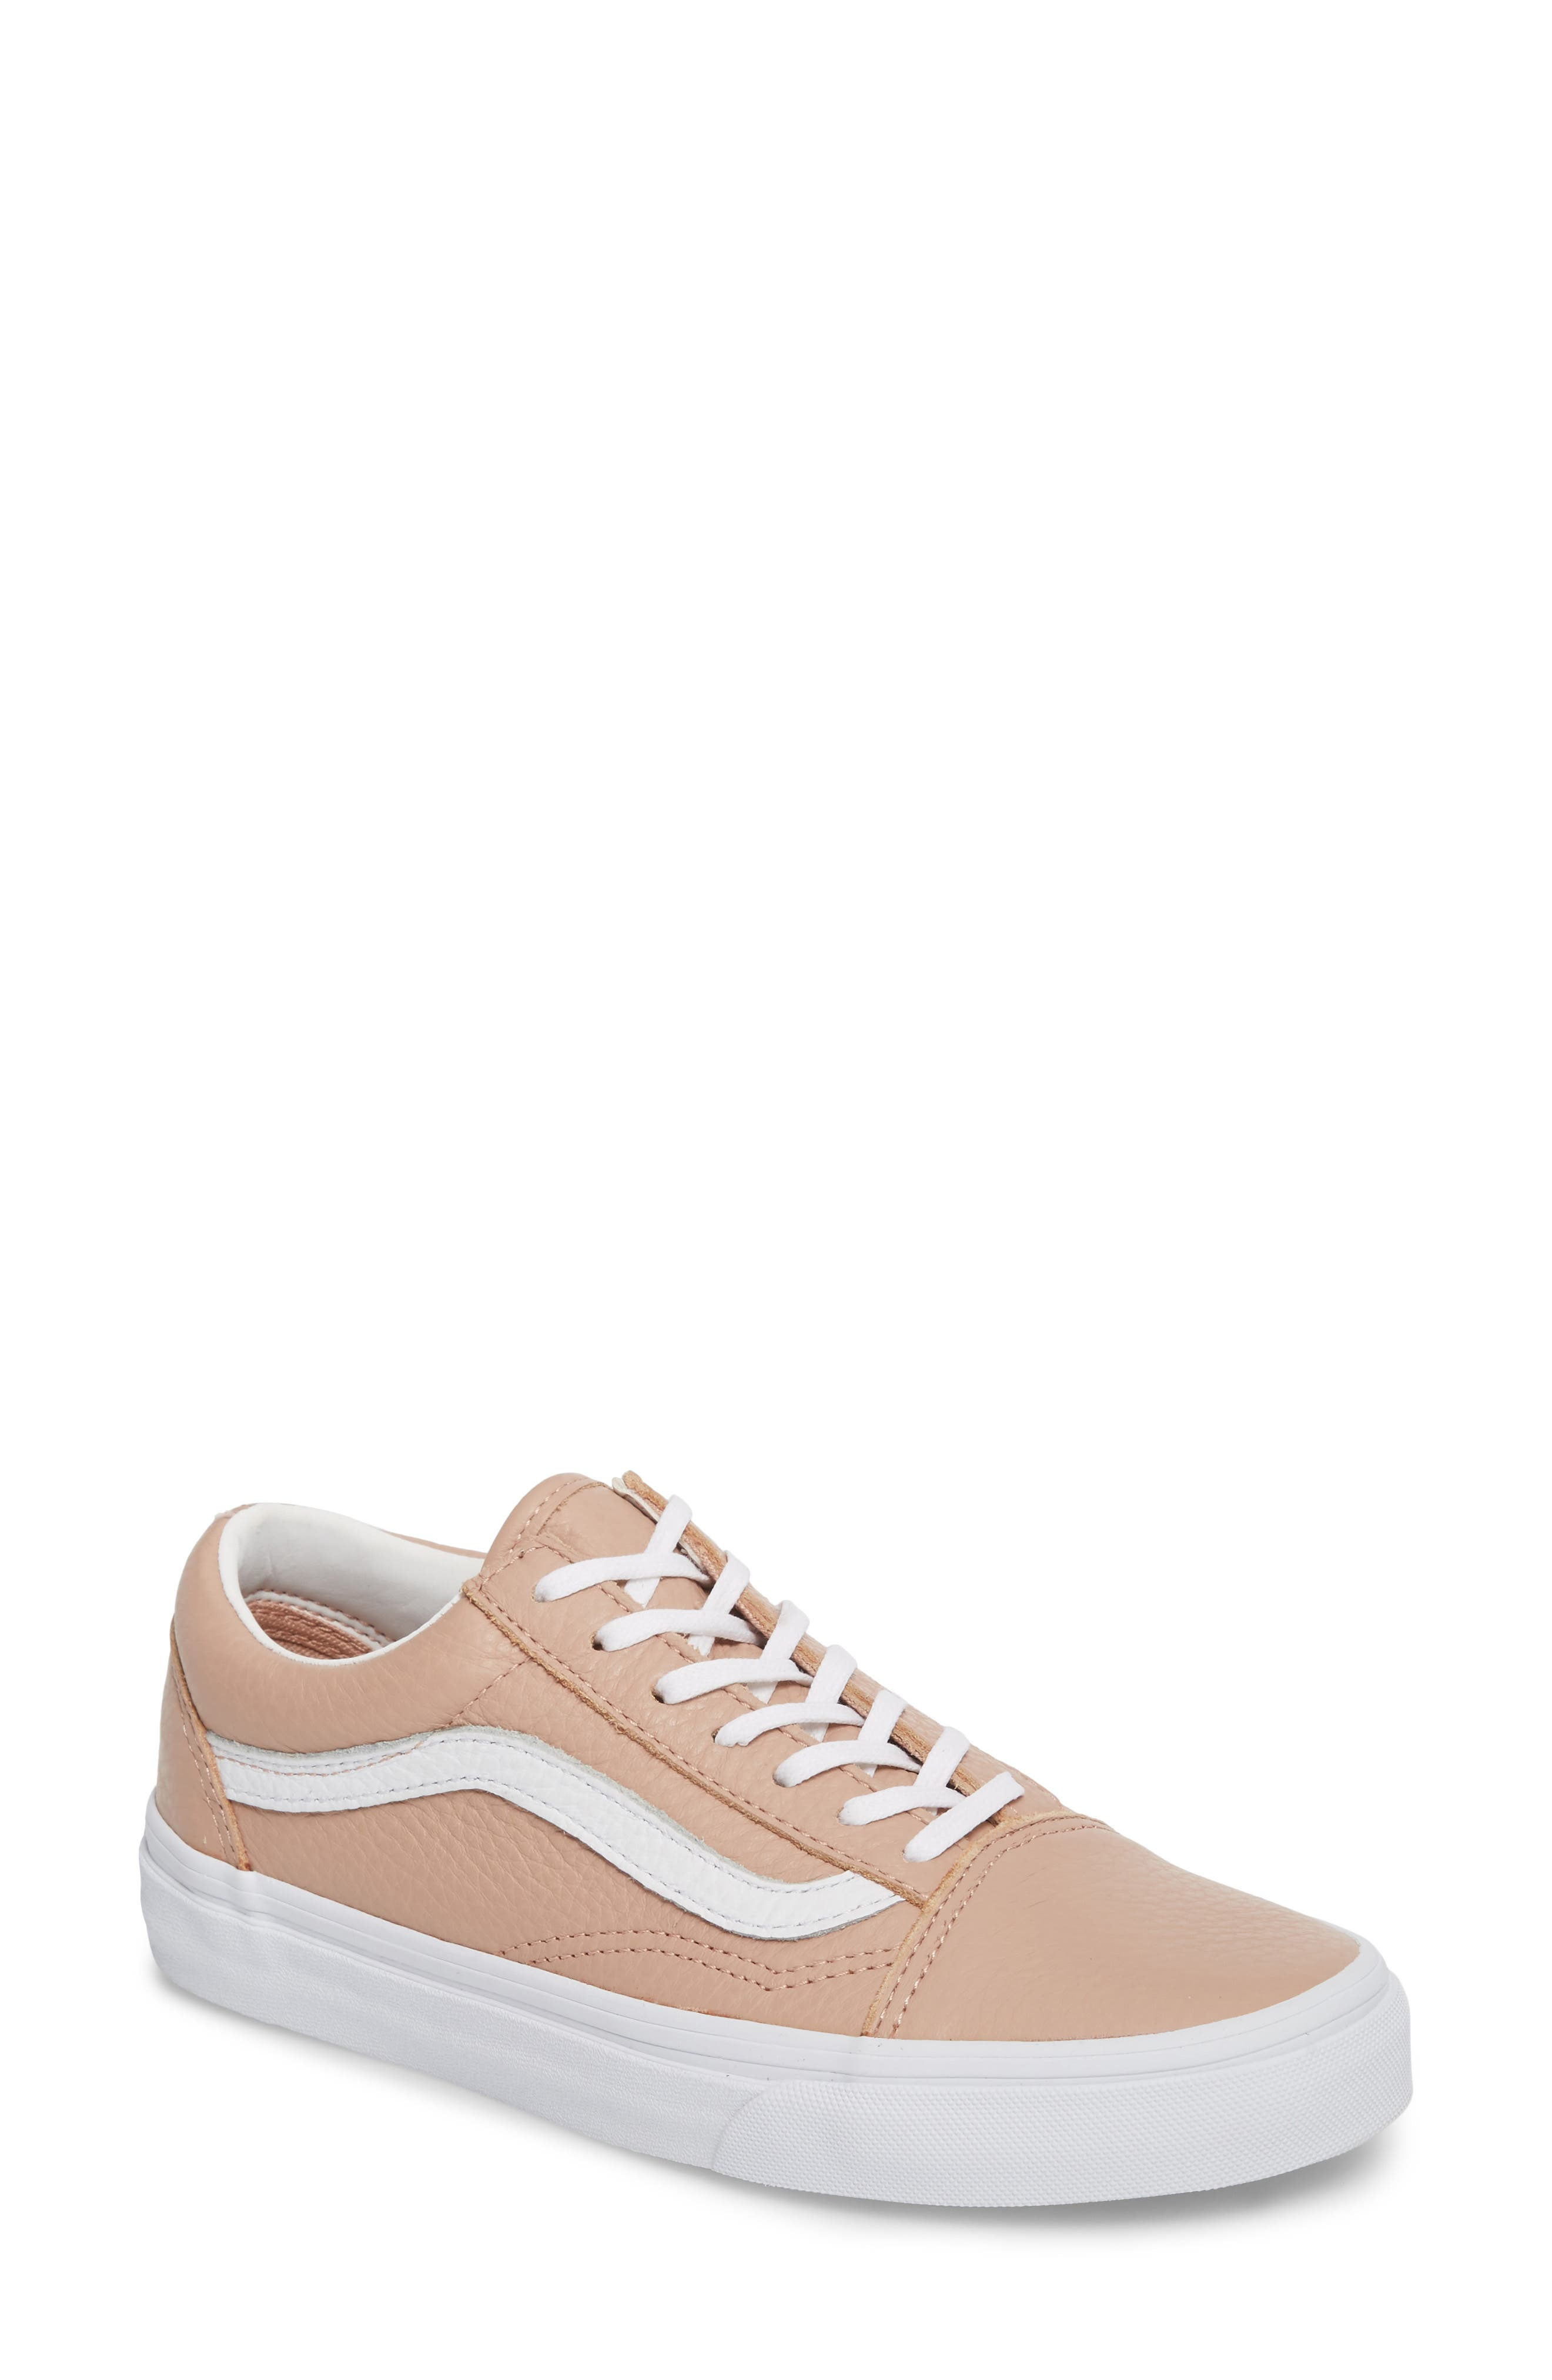 Old Skool DX Sneaker,                         Main,                         color, Mahogany Rose/ True White